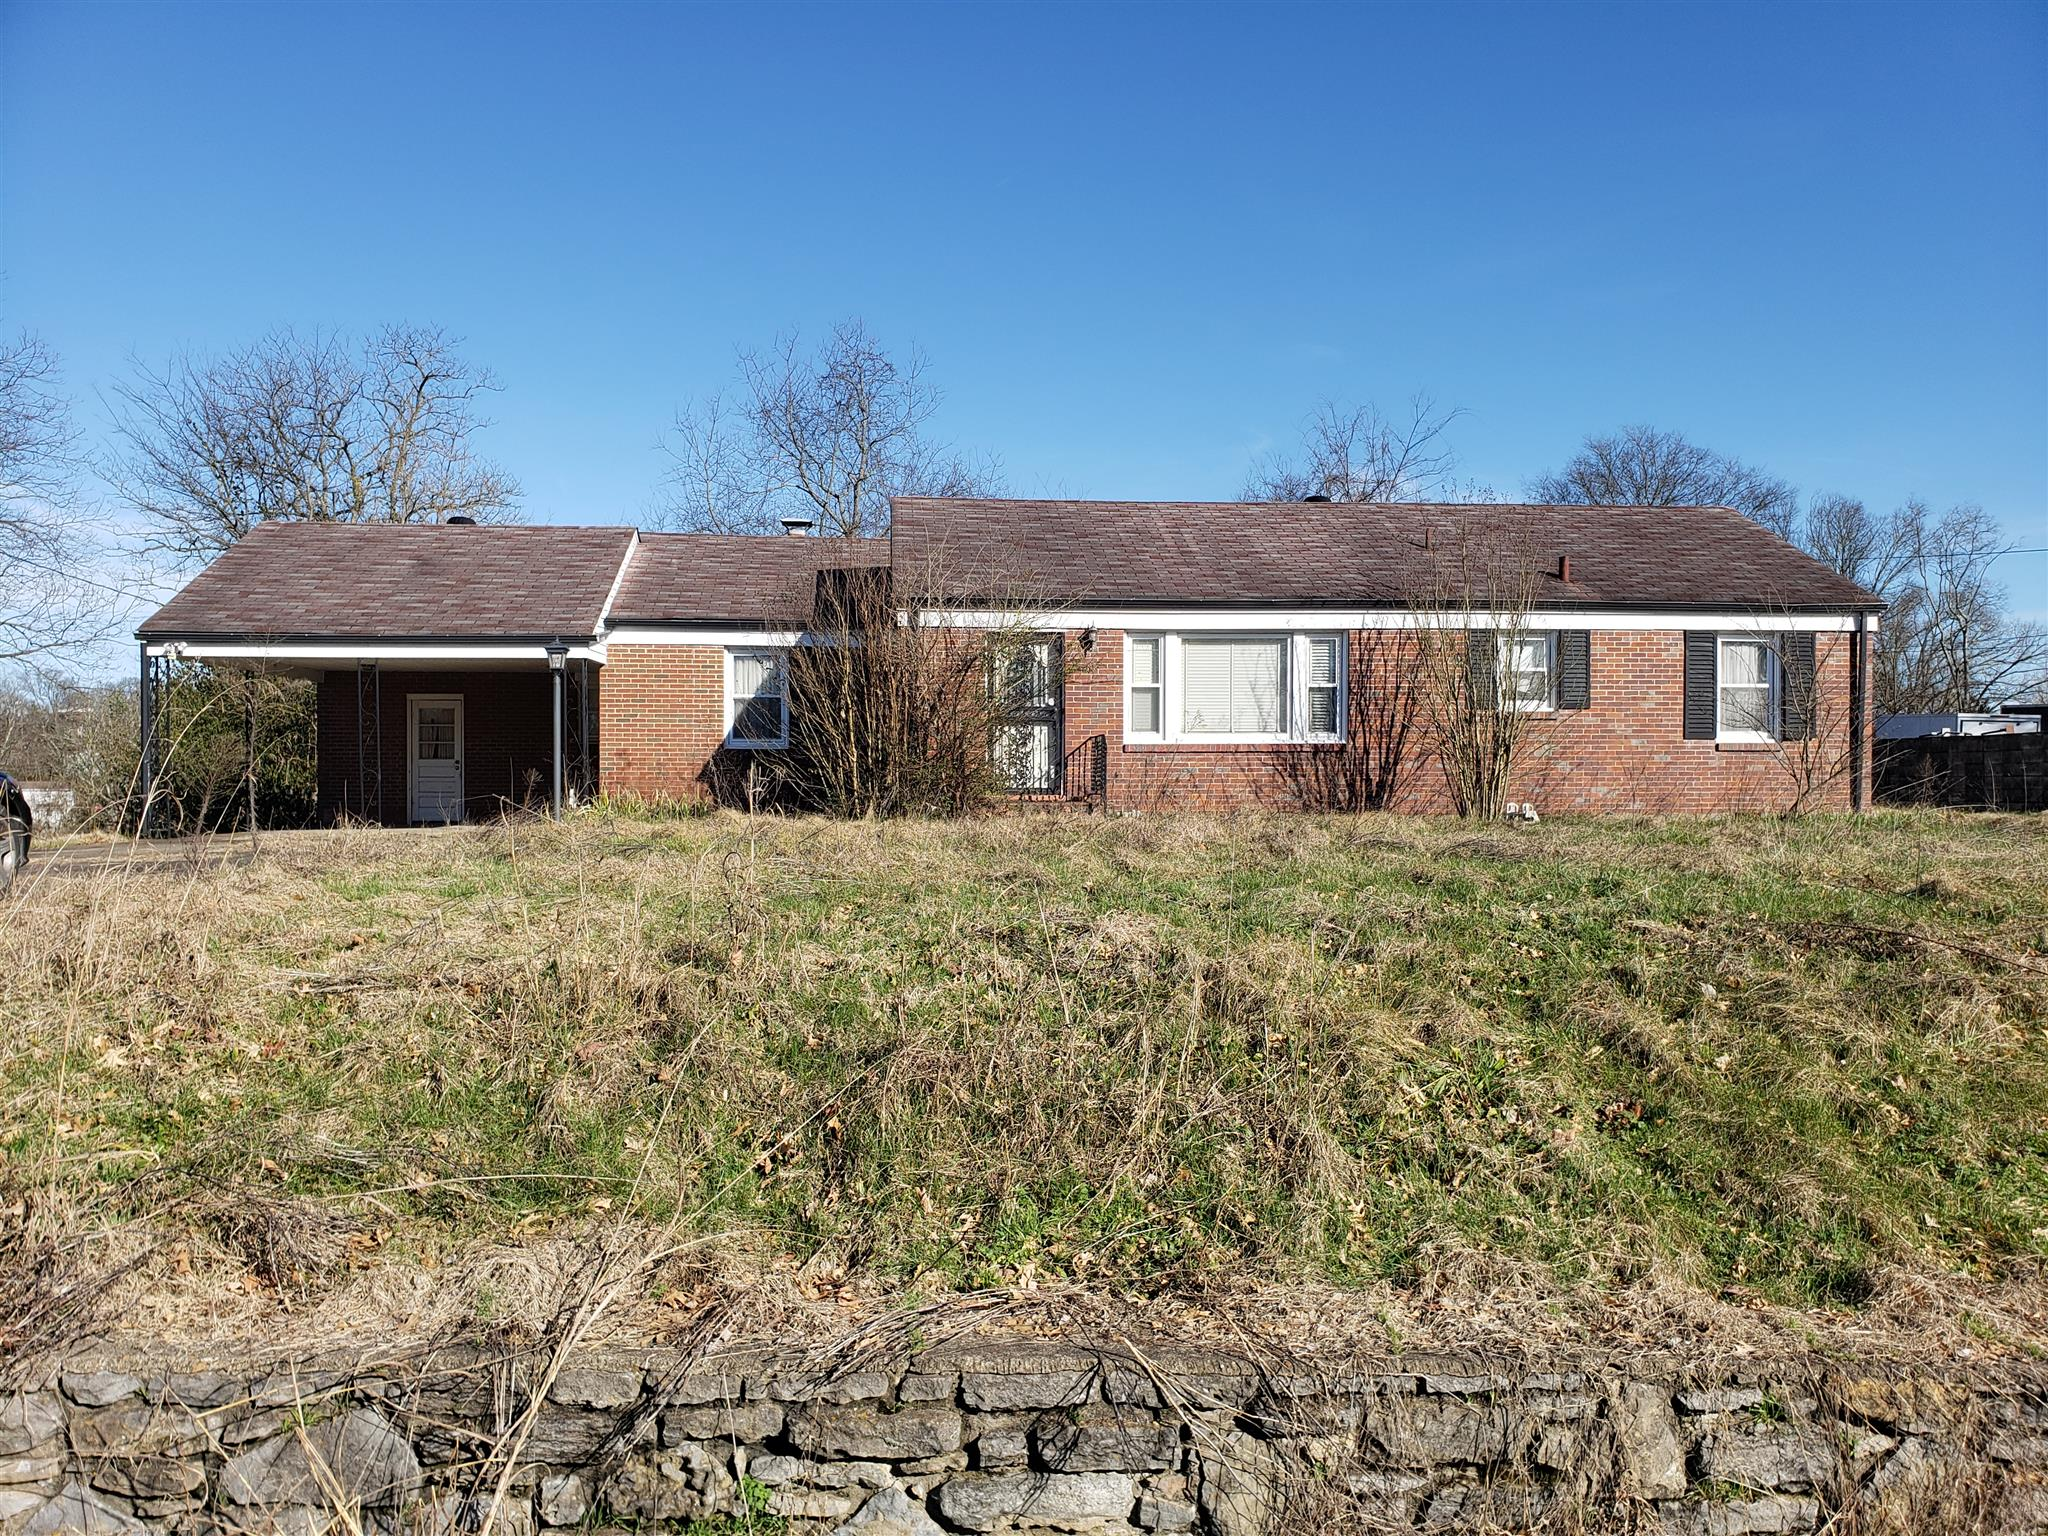 $130,000 - 3Br/2Ba -  for Sale in Haynies Heights, Nashville